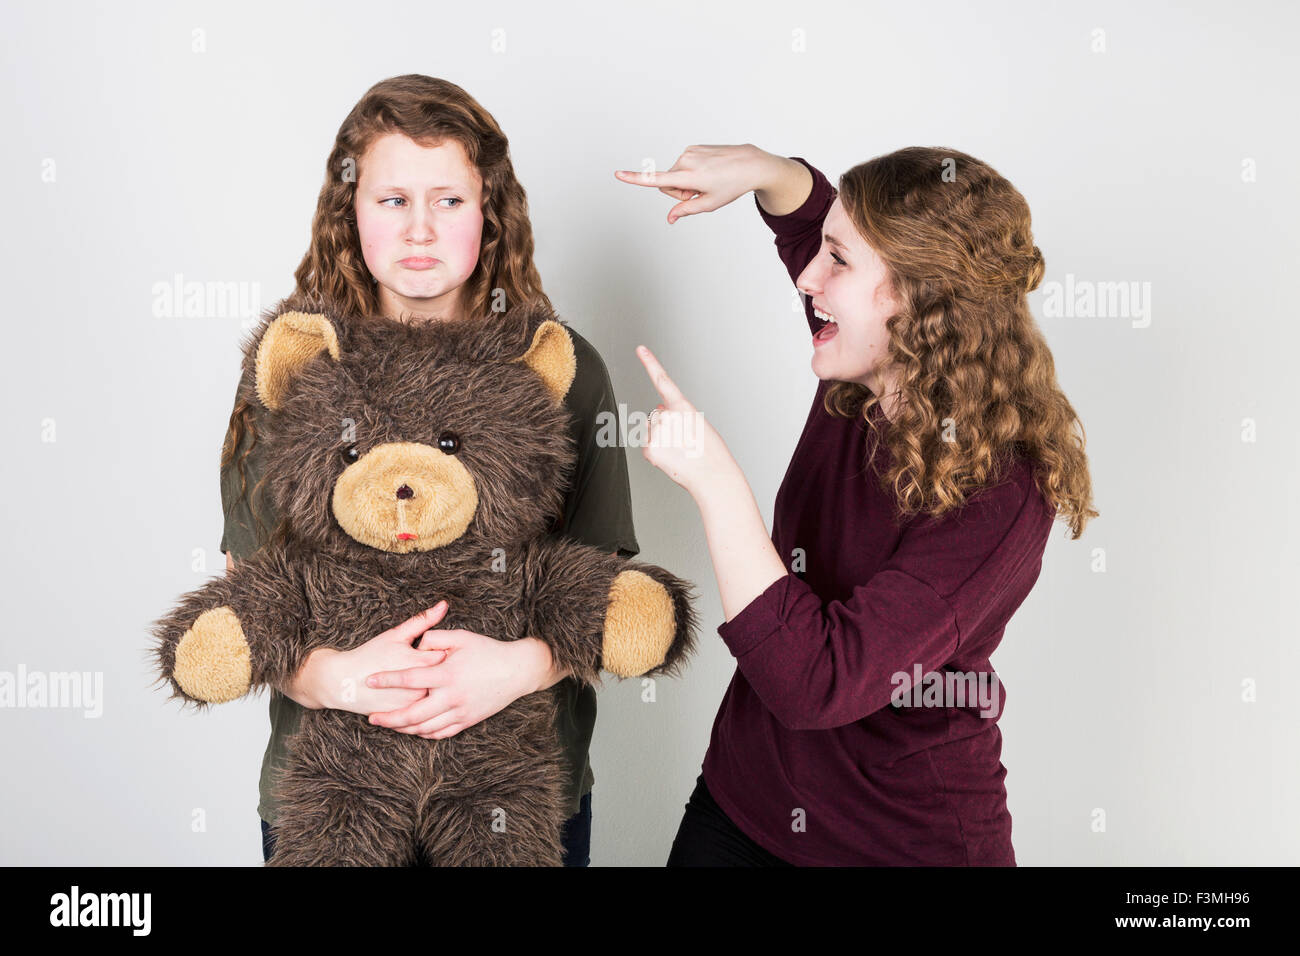 Girlfriends,Bullying,Teddy Bear,Sneering Stock Photo